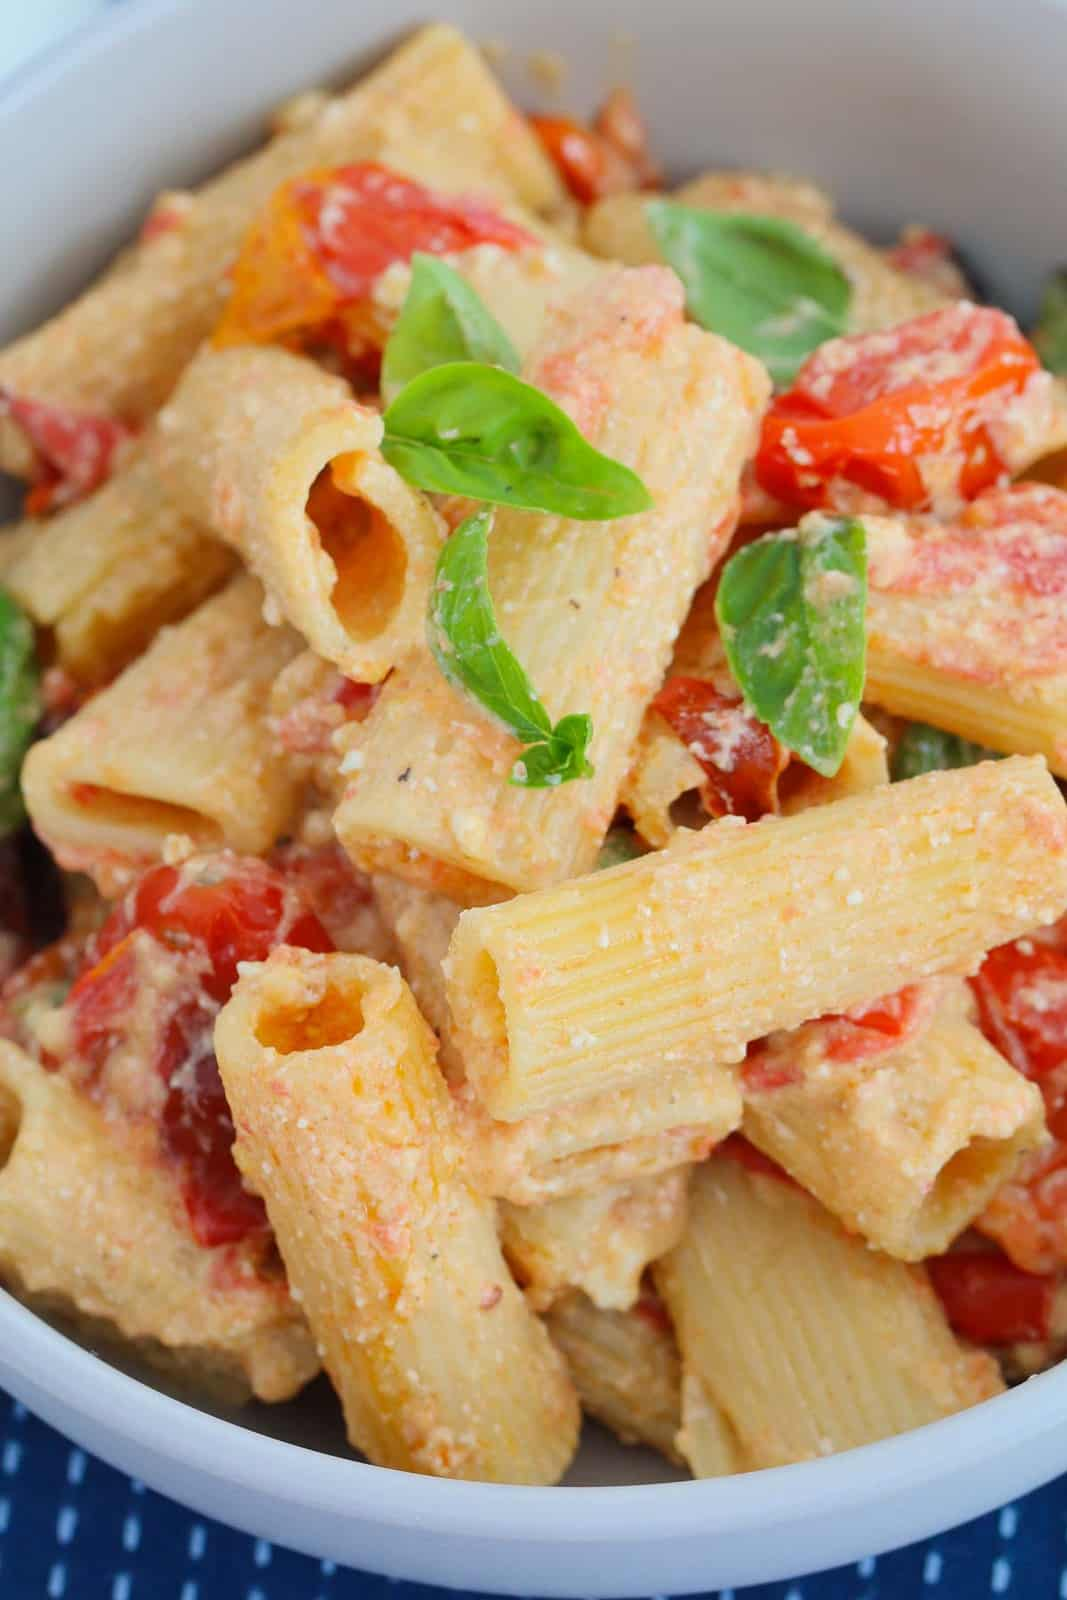 A bowl of rigatoni with basil, tomato and feta.